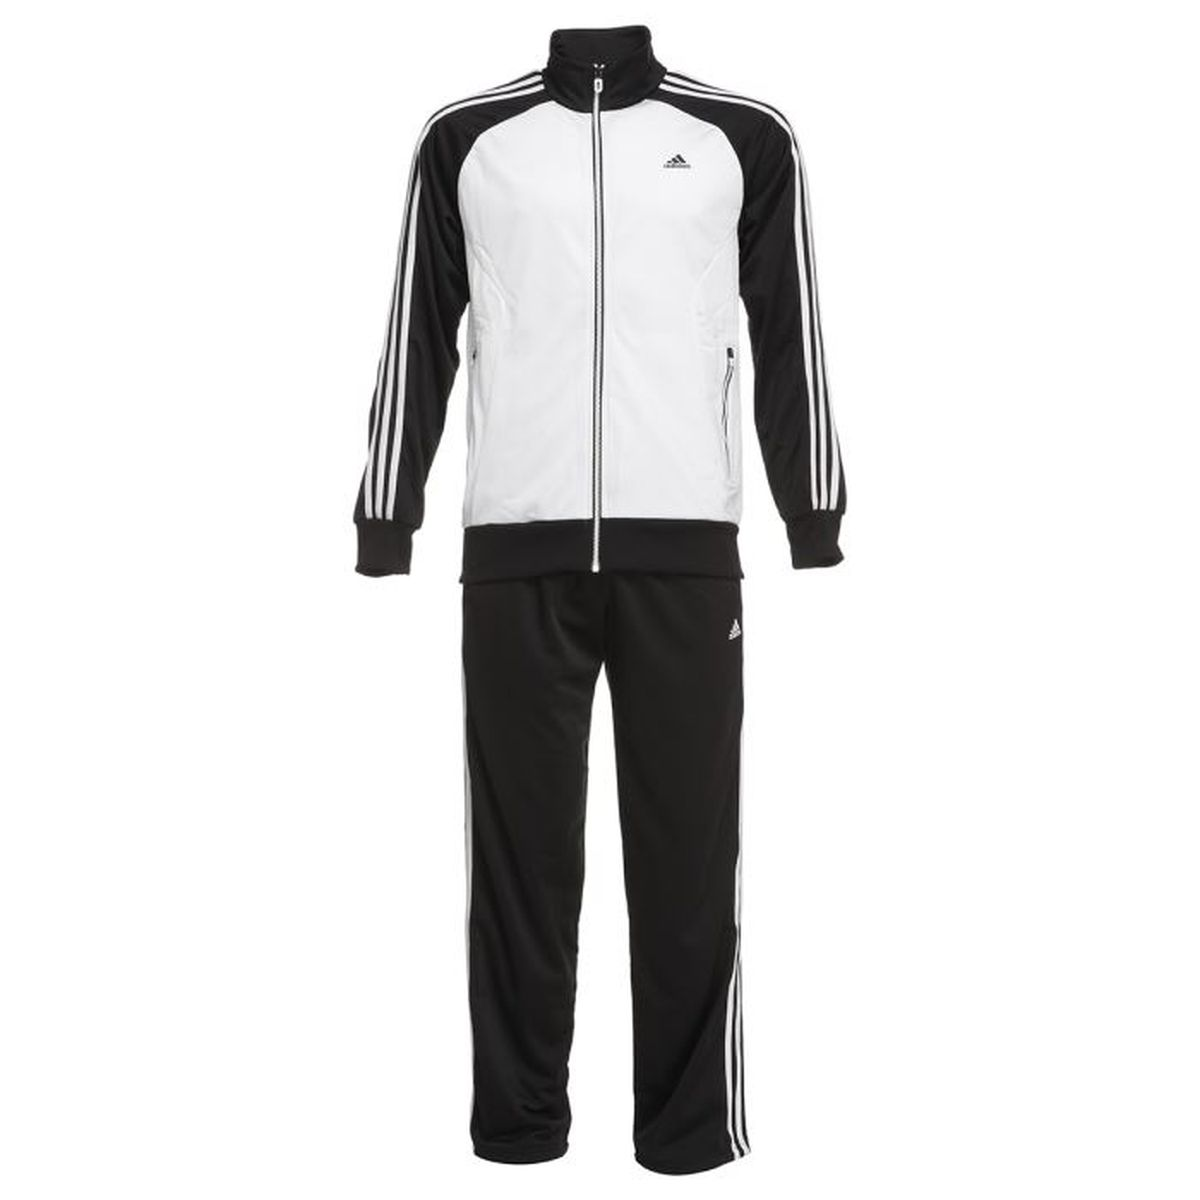 adidas Herren Trainingsanzug Riberio, WhiteBlack, 8, W61607